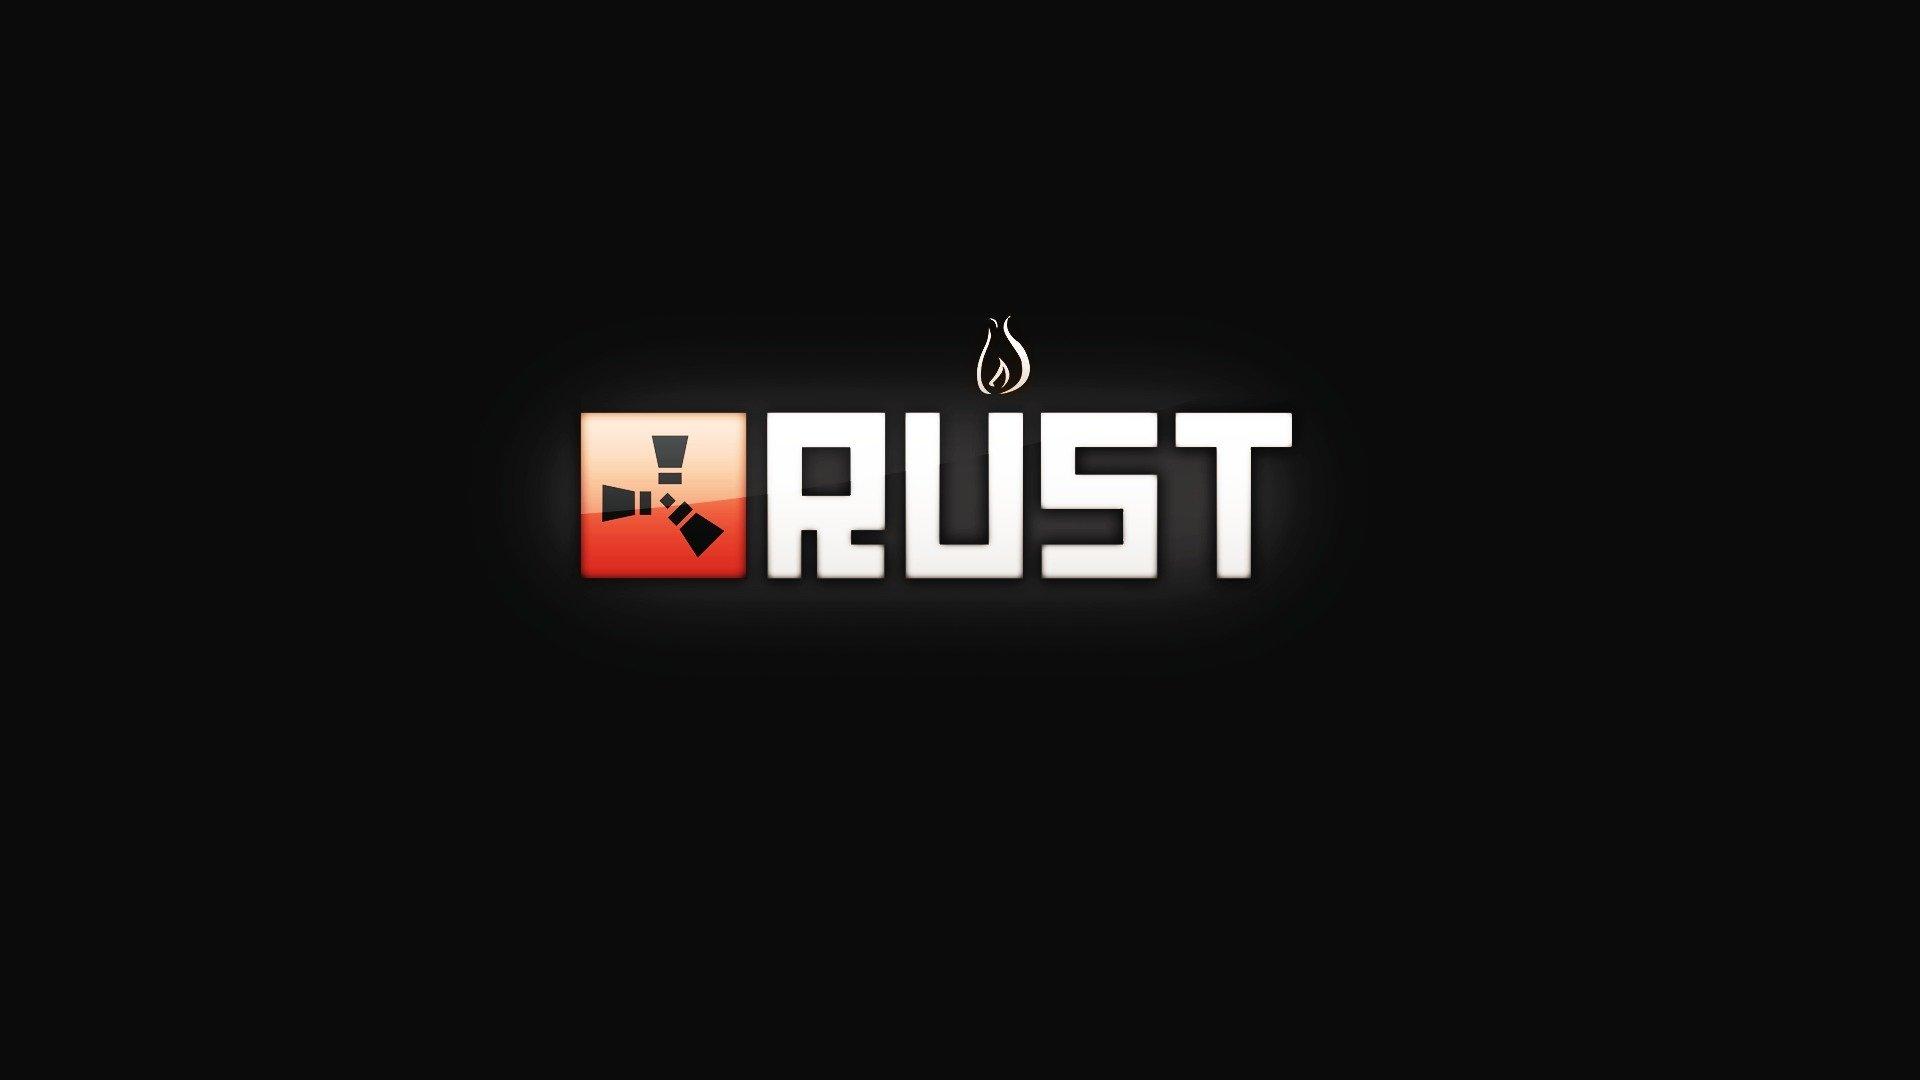 rust game logo wallpaper 74564